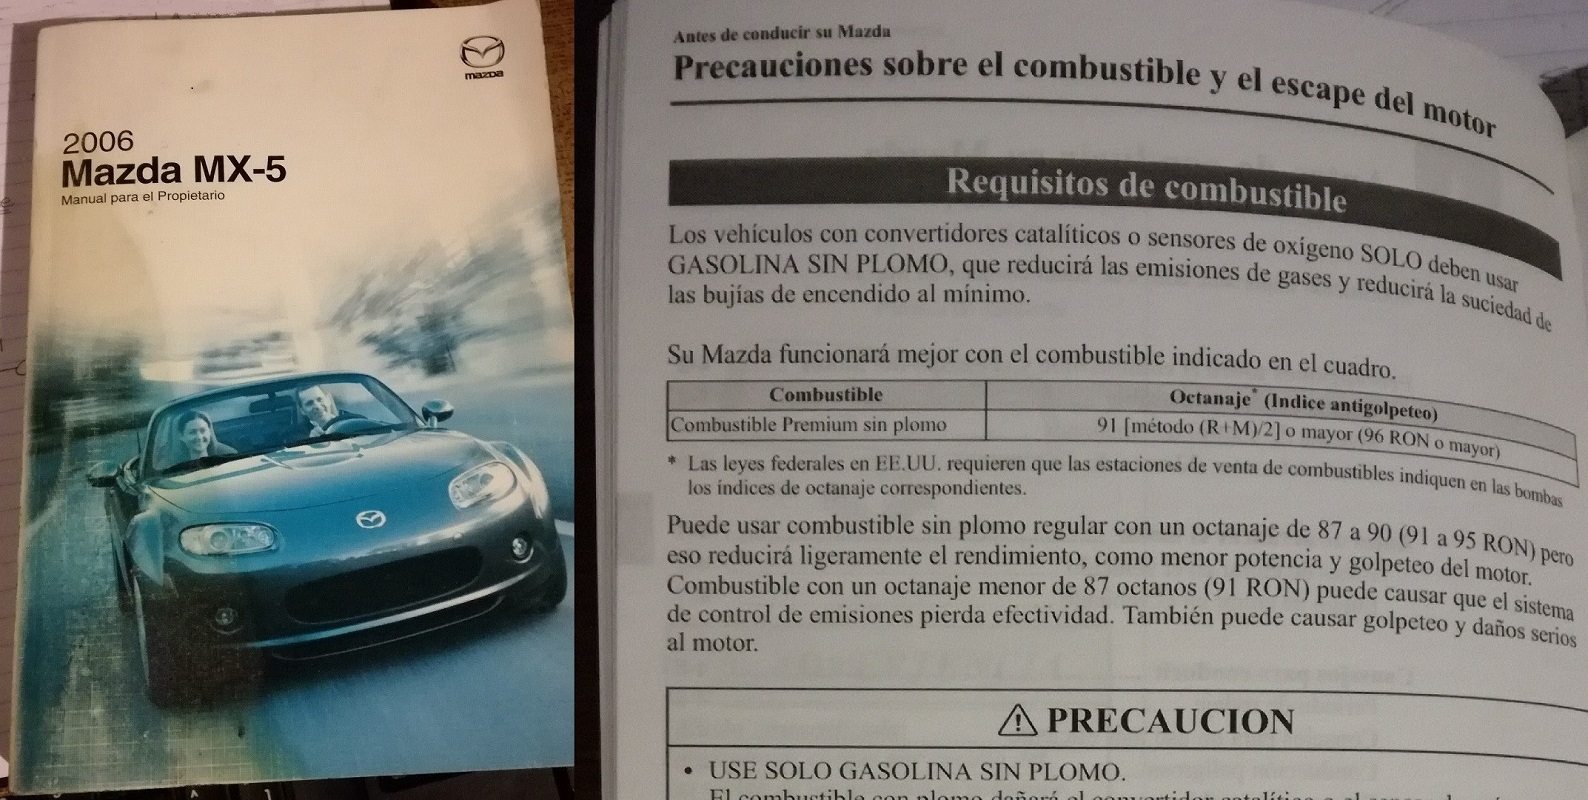 1.6T(200cv) gasolina 98 o de 95 - Página 2 Mazda